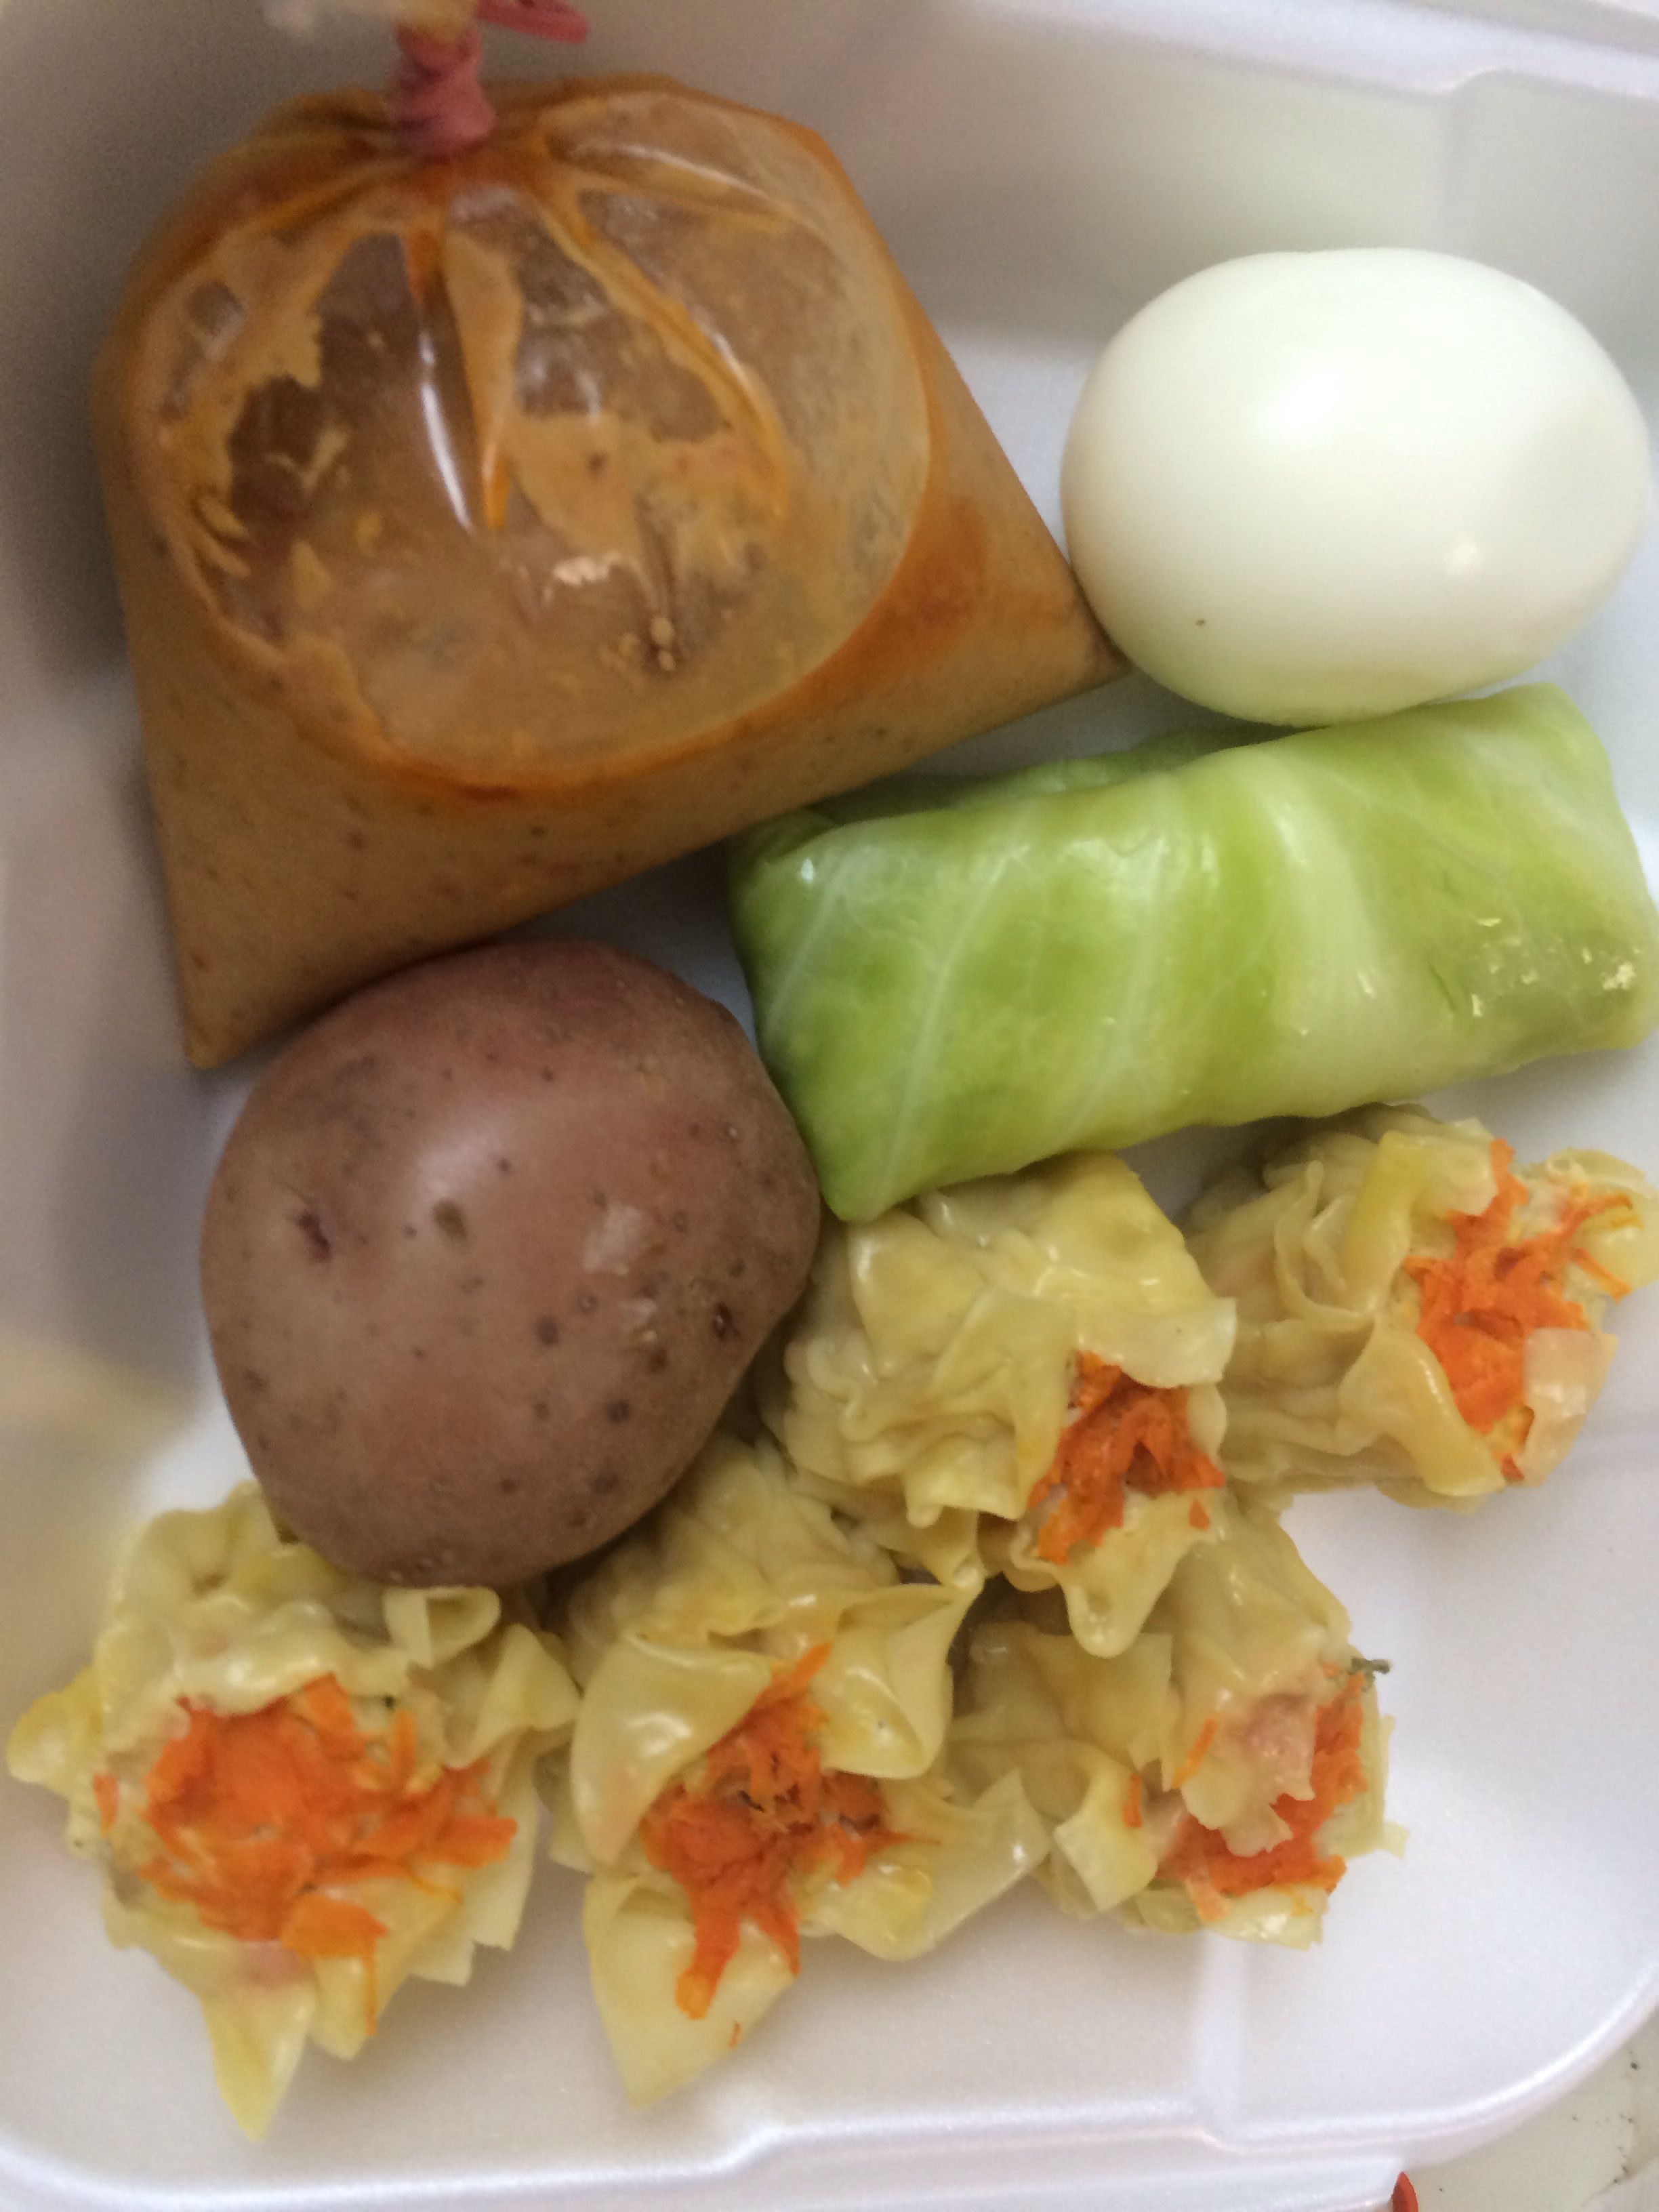 Somai Masakan Indonesia Food Pinterest Indonesian Kacang Goreng Lapis Telor Telur Medan Premium 500 Gram